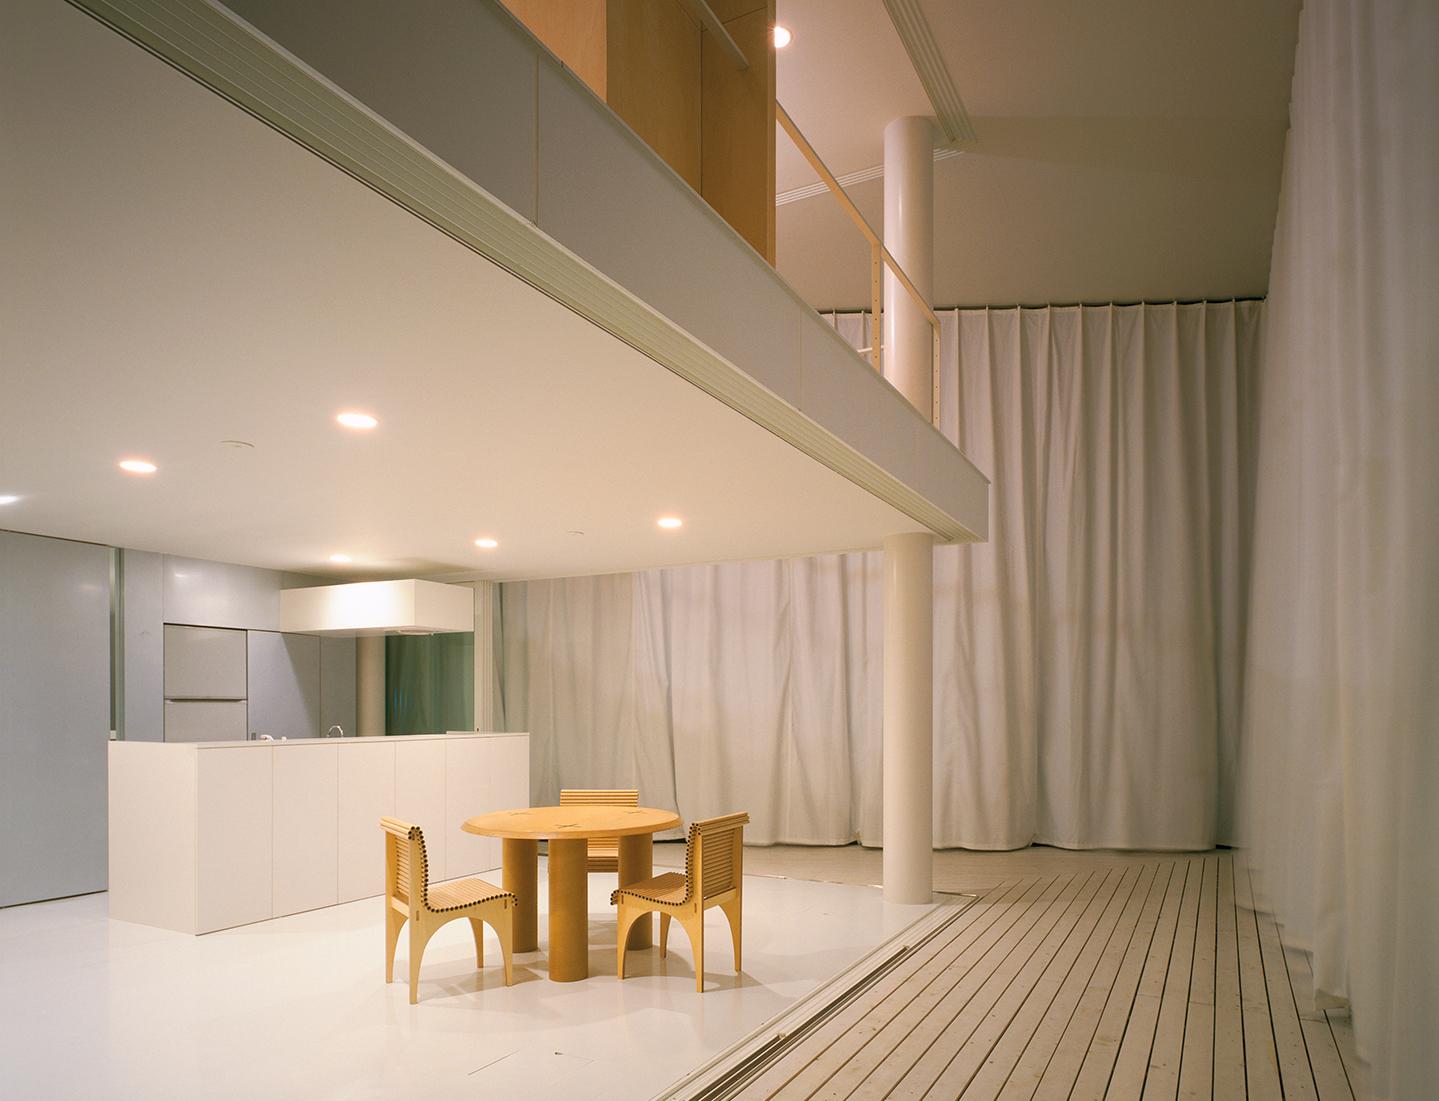 Curtain Wall Church : Shigeru ban the pritzker architecture prize